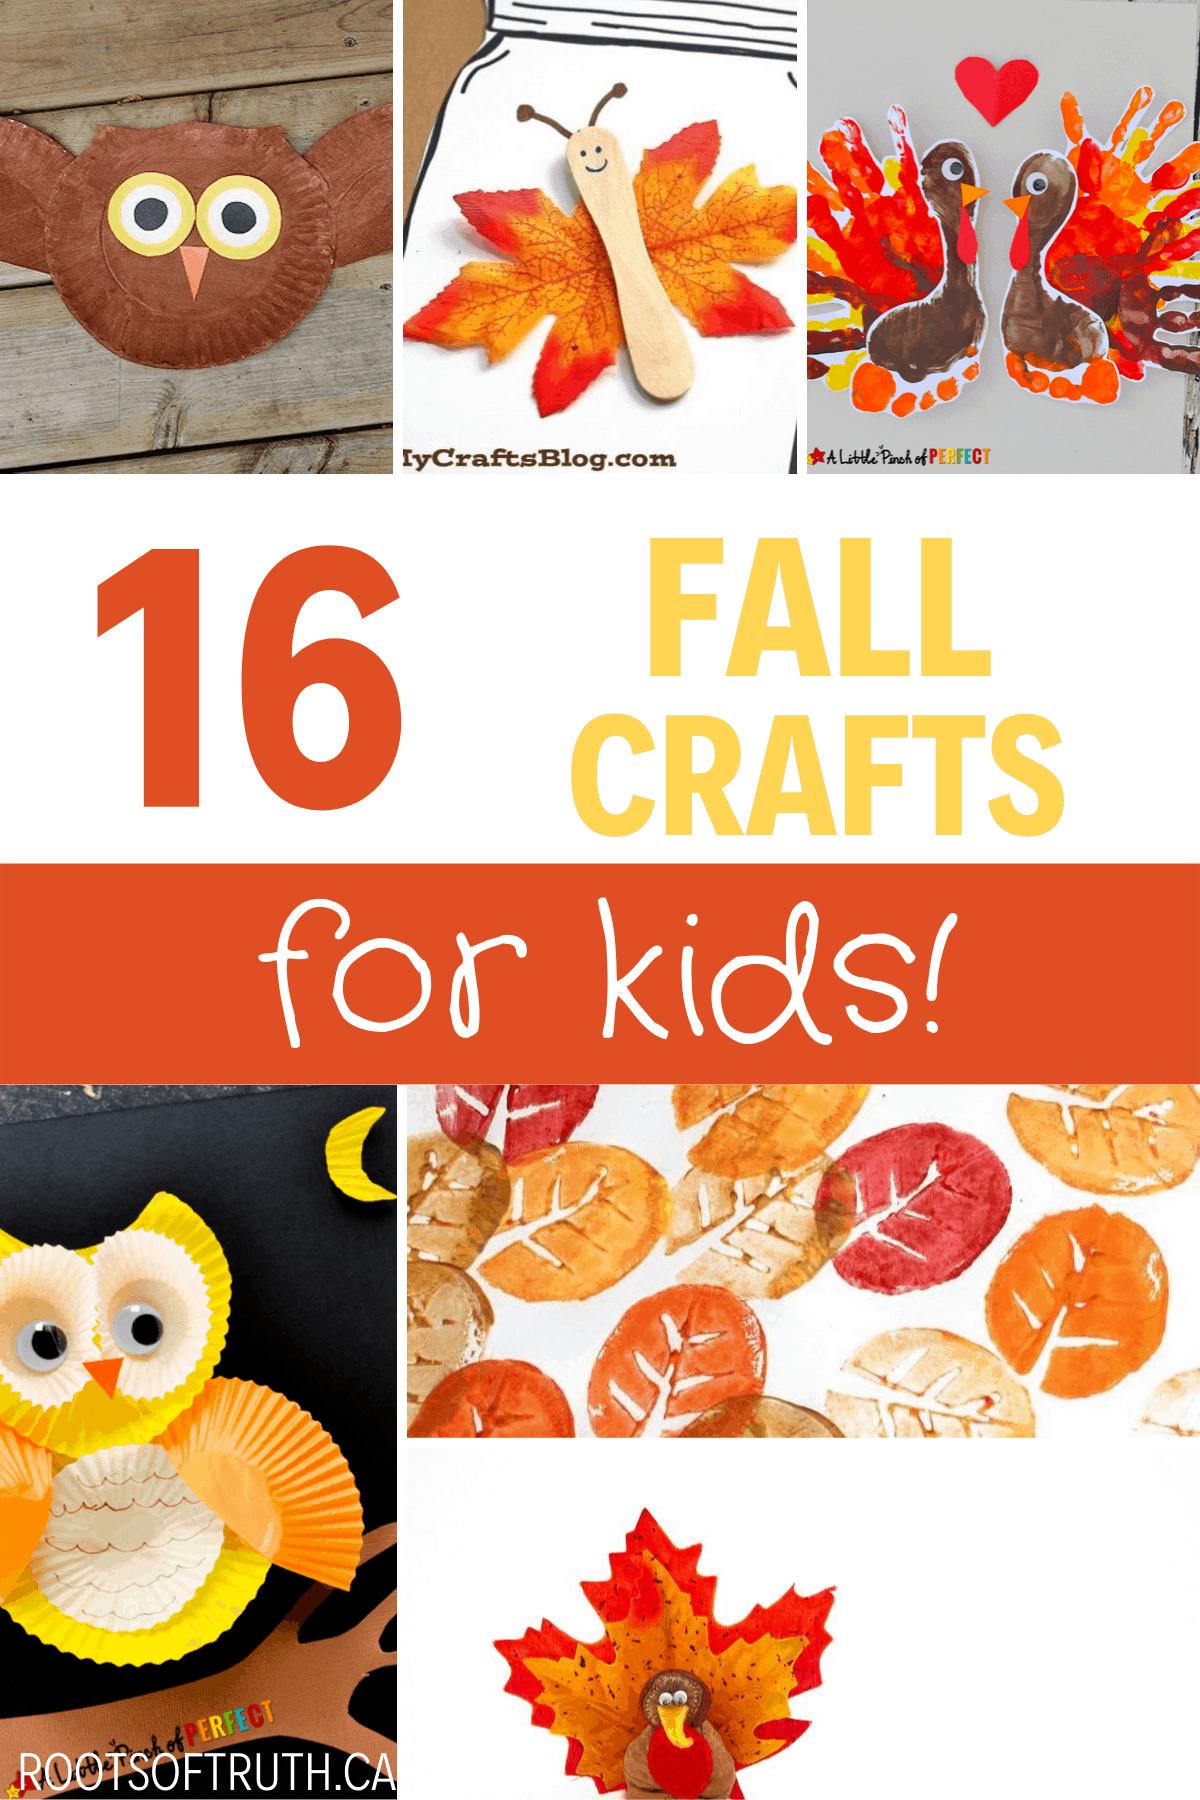 fall crafts for kids/halloween/autumn/diy/kids/easy/fun